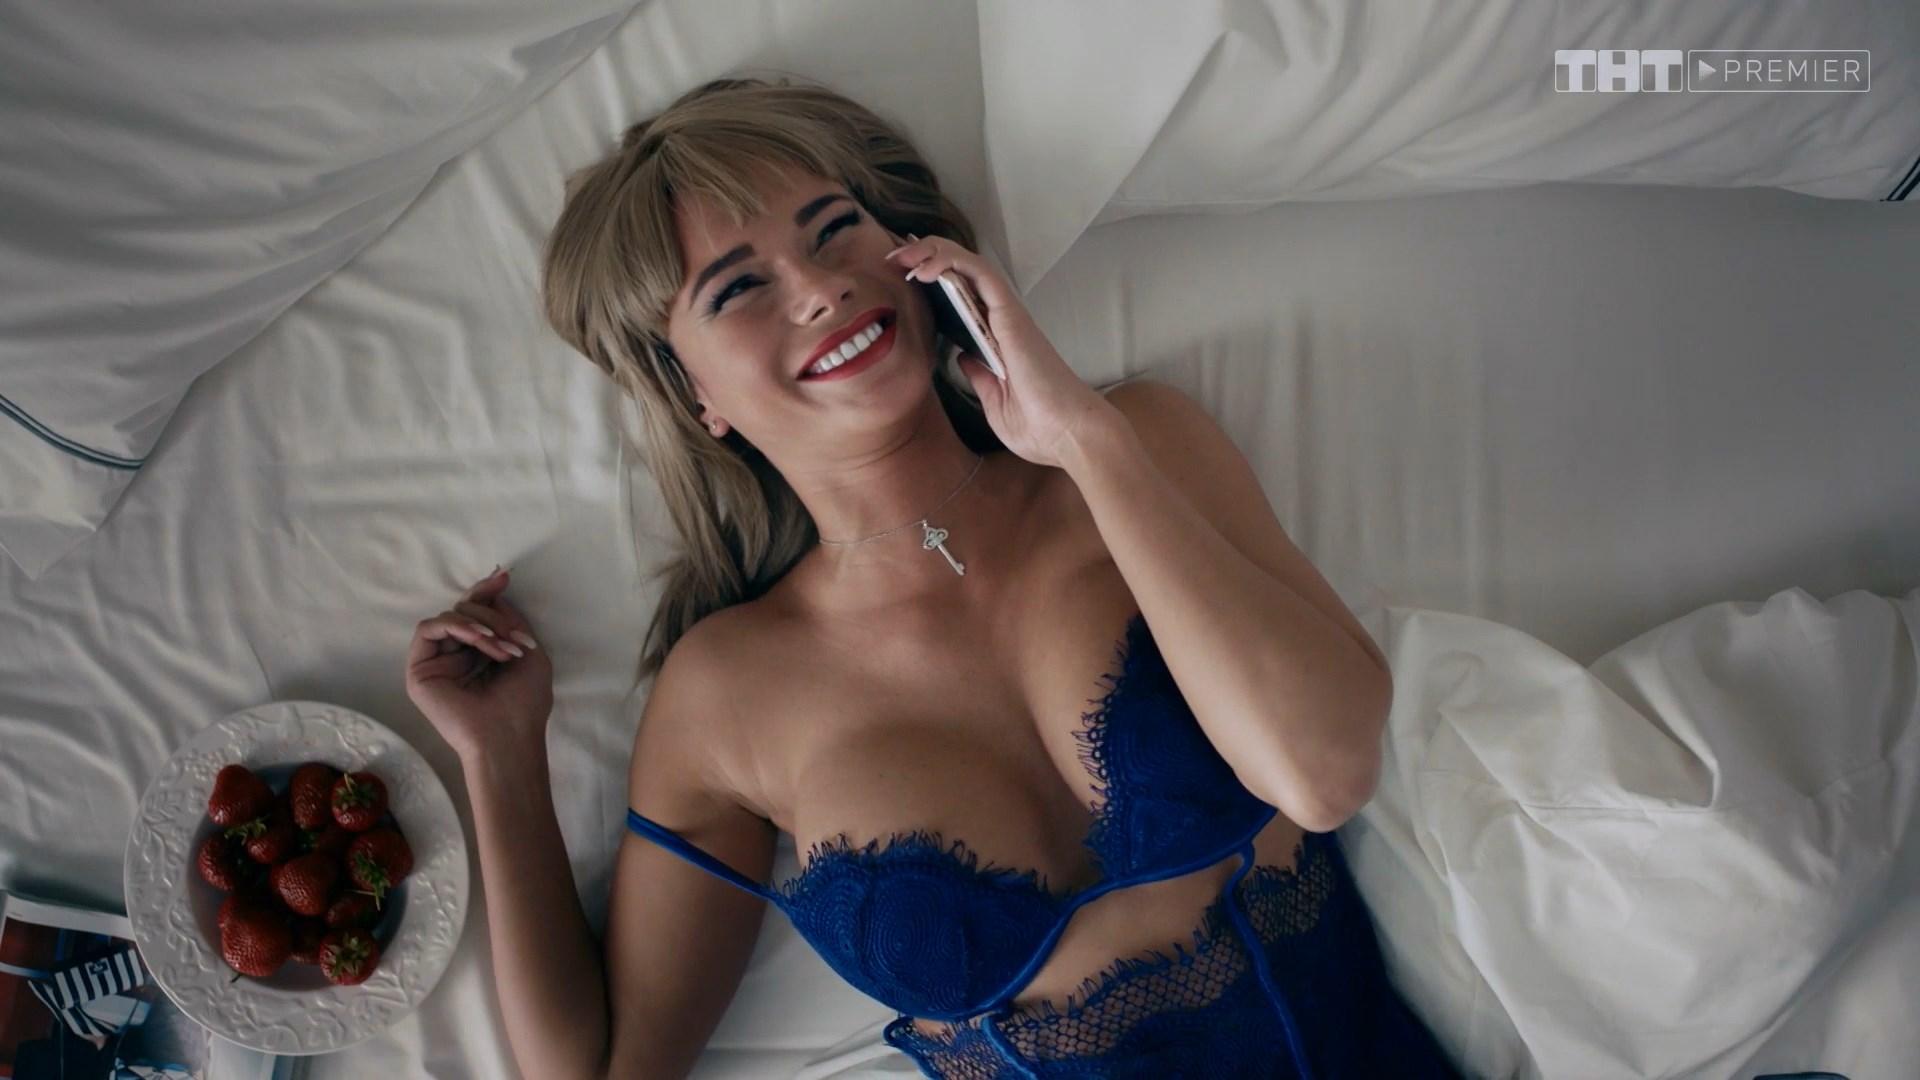 Celebrity Julieanna Goddard nude (85 foto and video), Pussy, Bikini, Instagram, cameltoe 2019